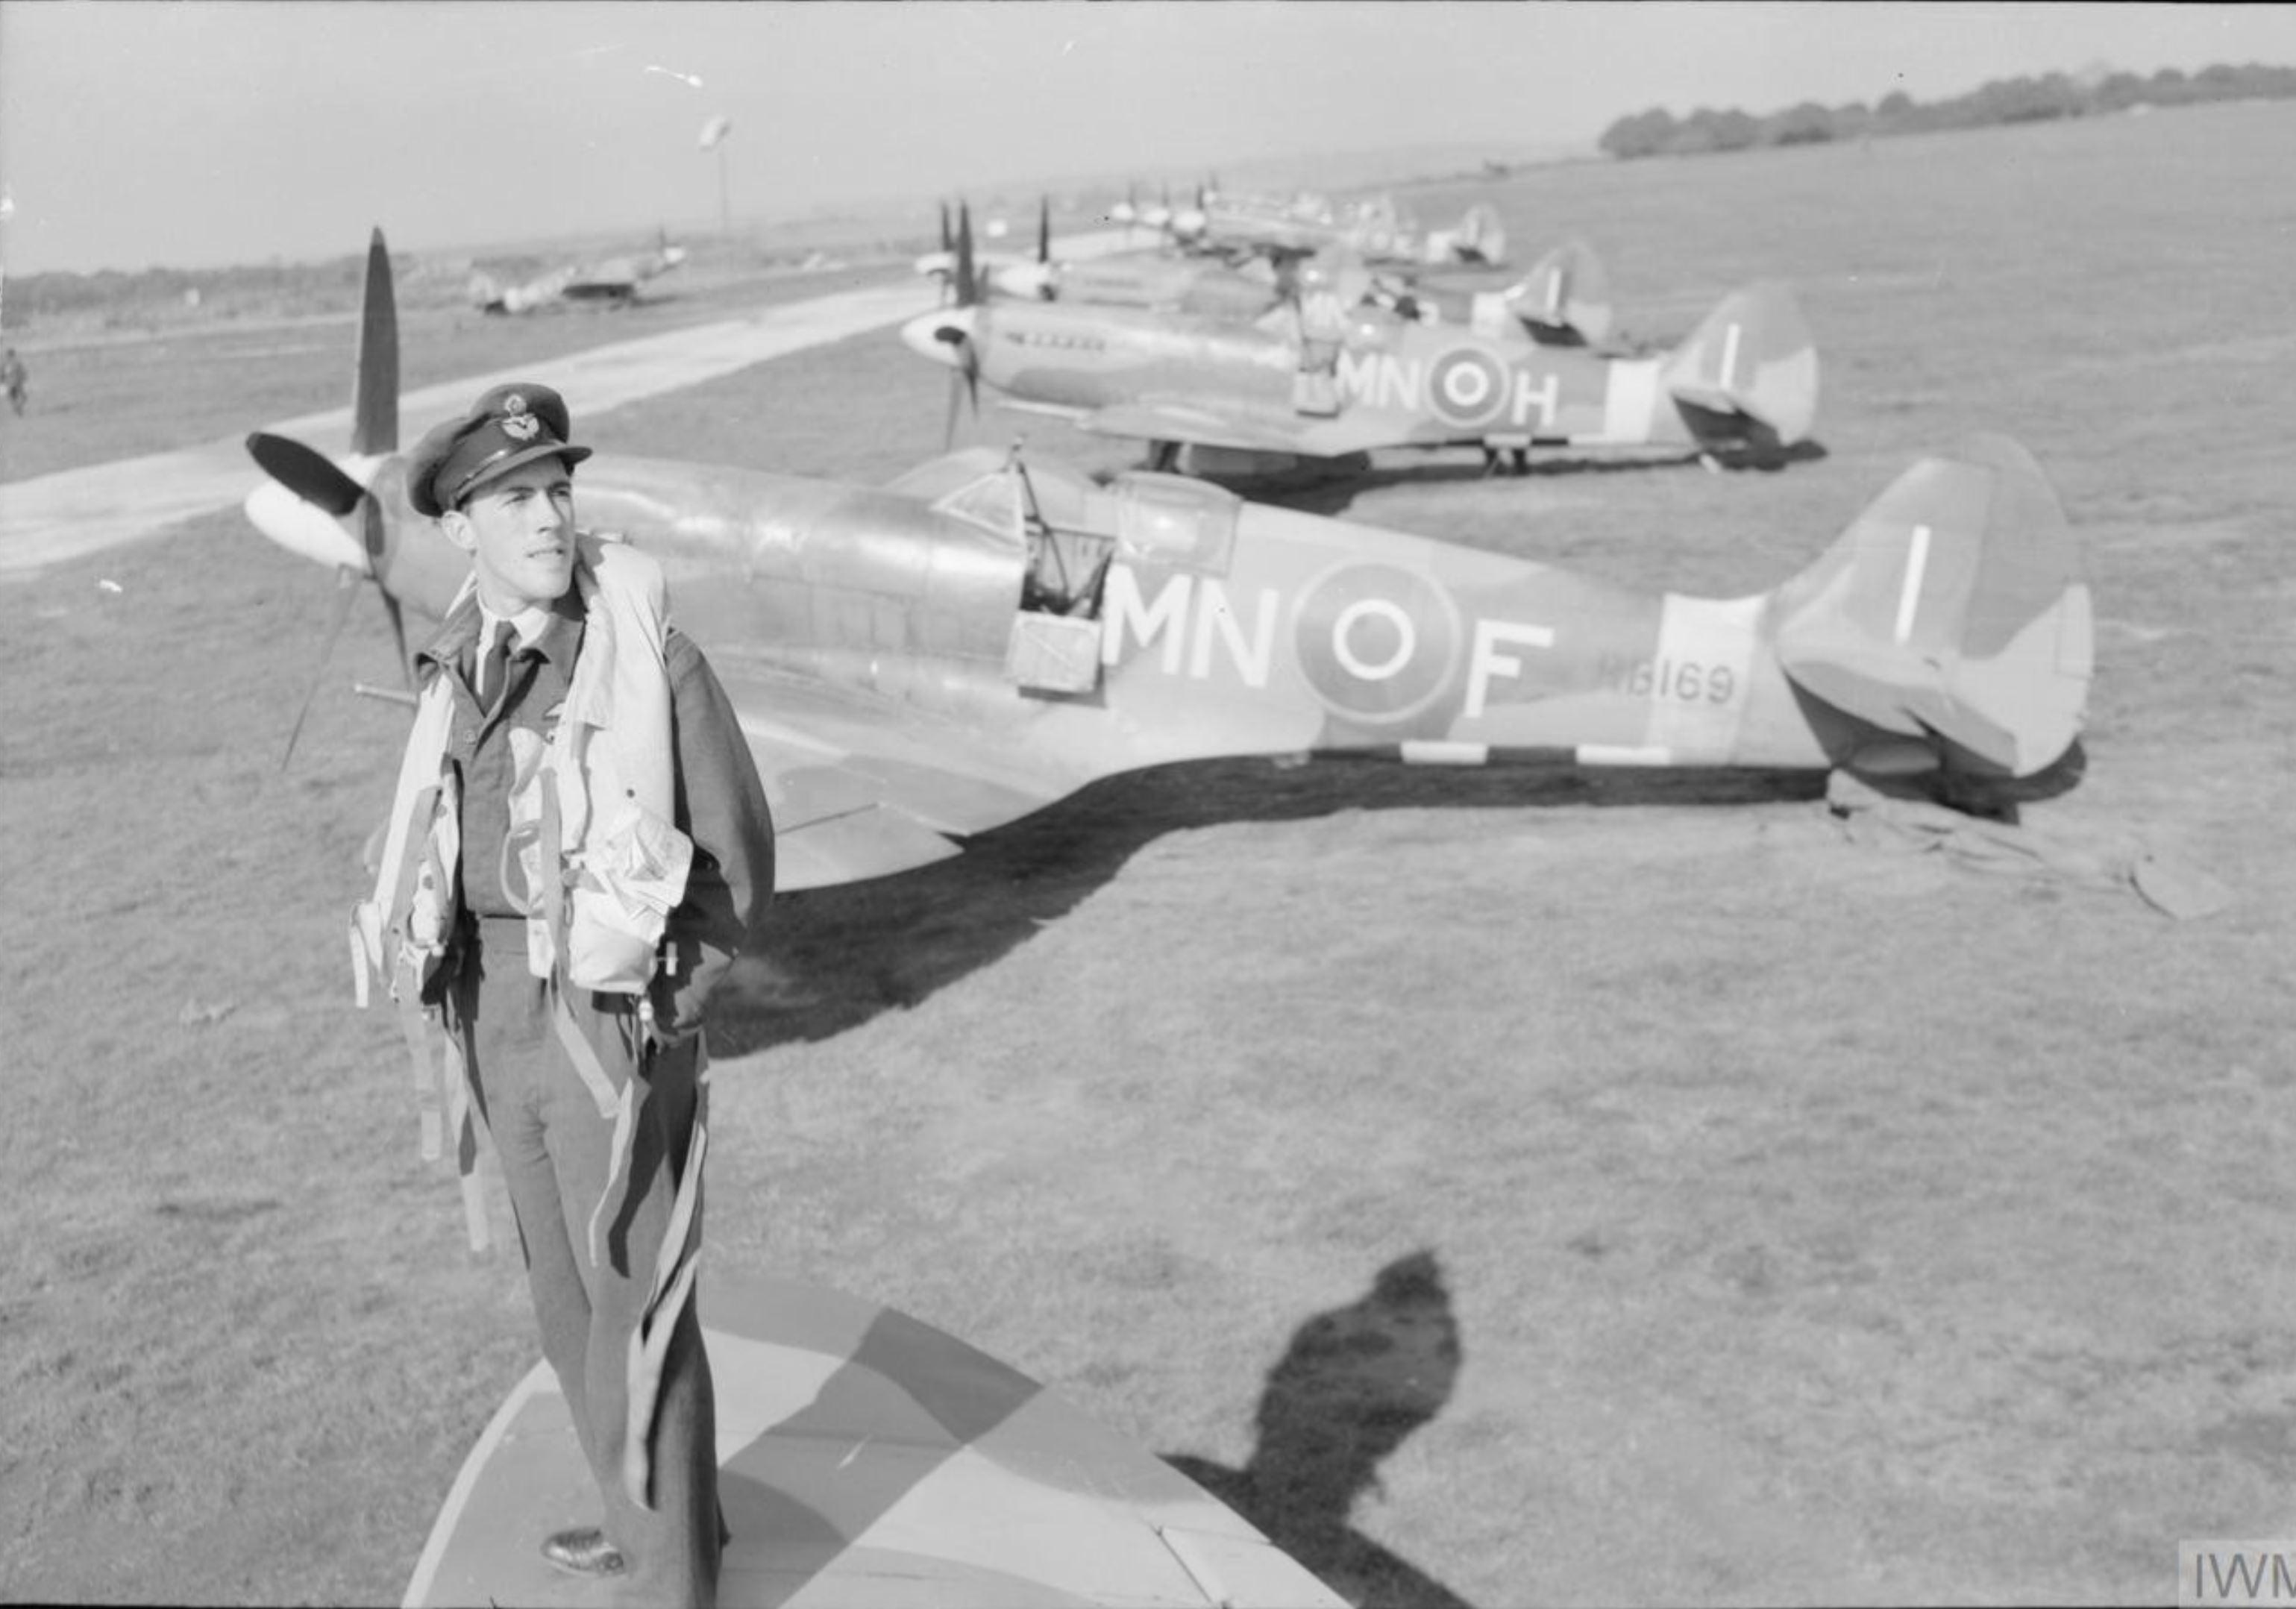 Spitfire XIVe RAF 350Sqn MNF RB169 at Lympne Kent IWM CL1364